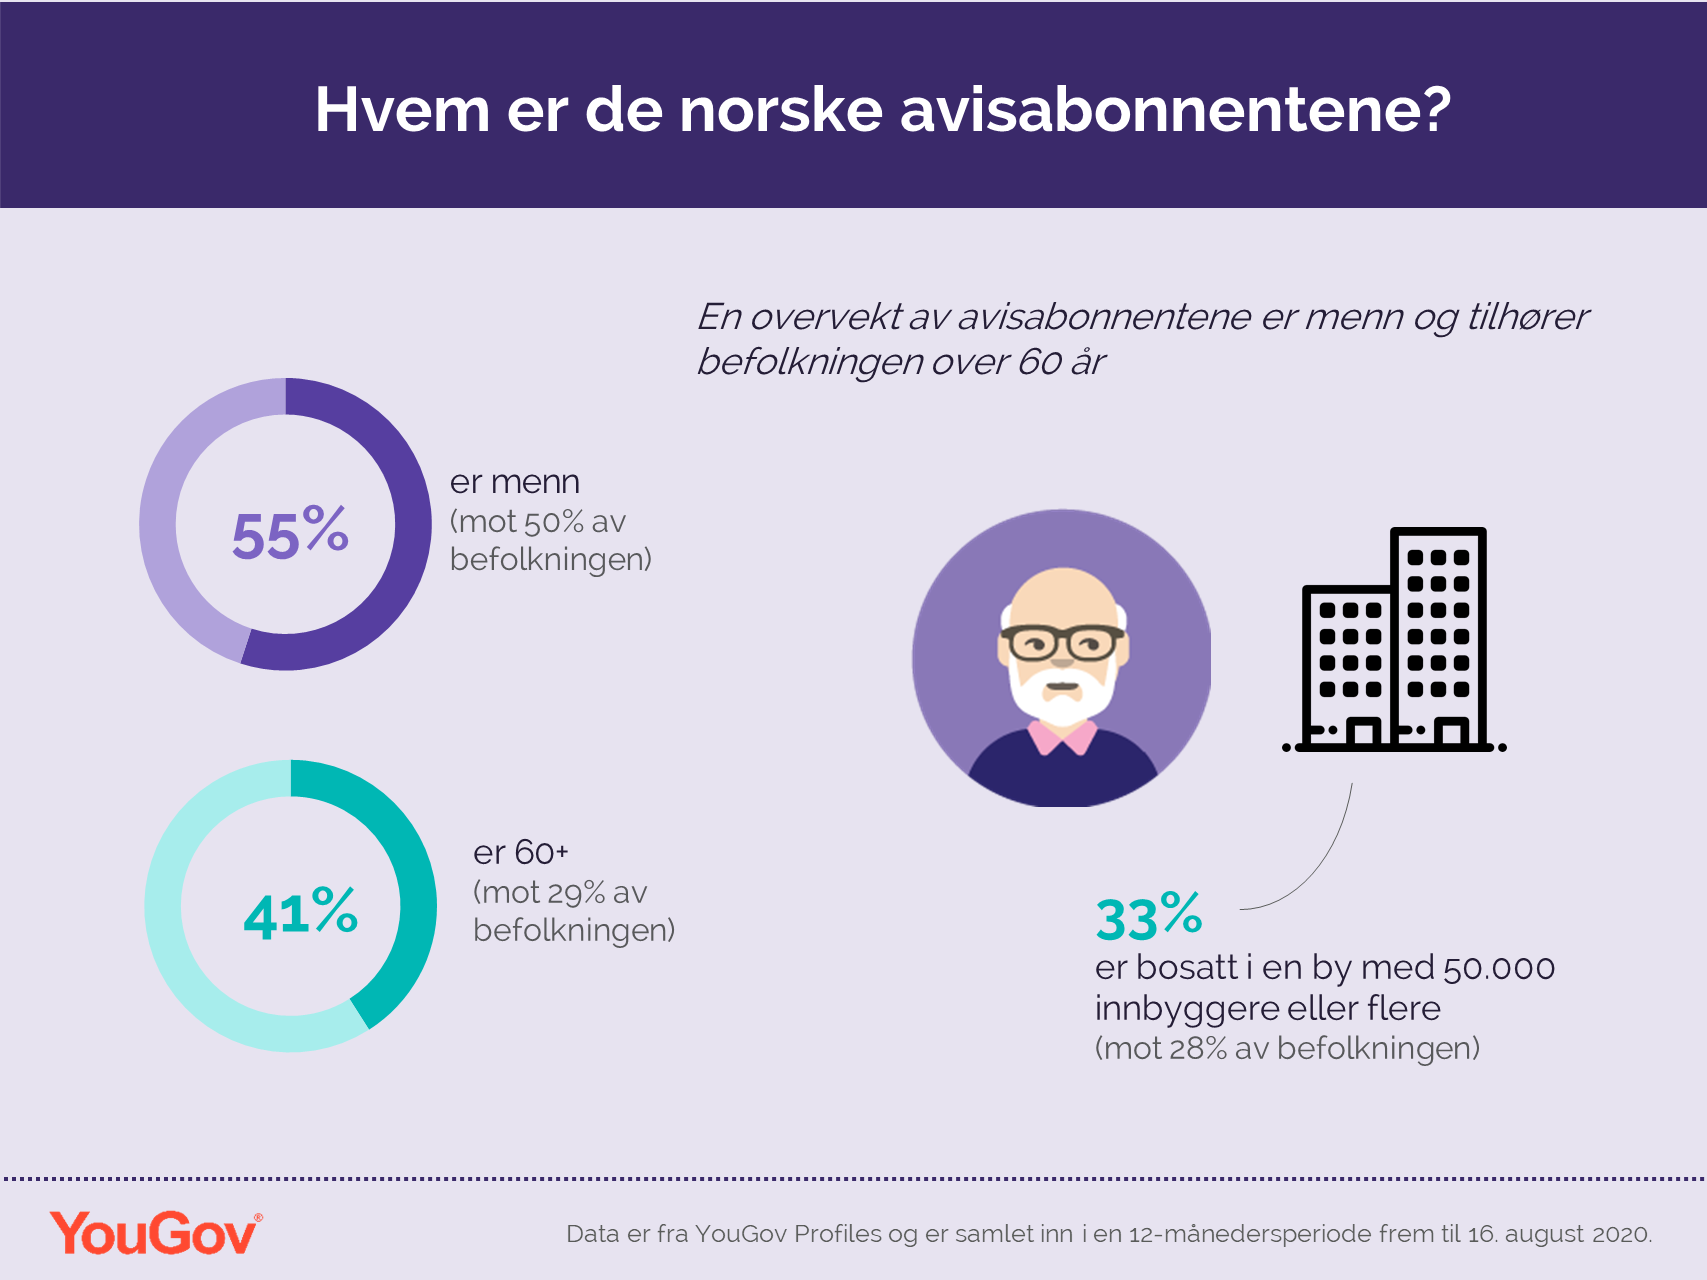 Hvem er de norske avisabonnentene?